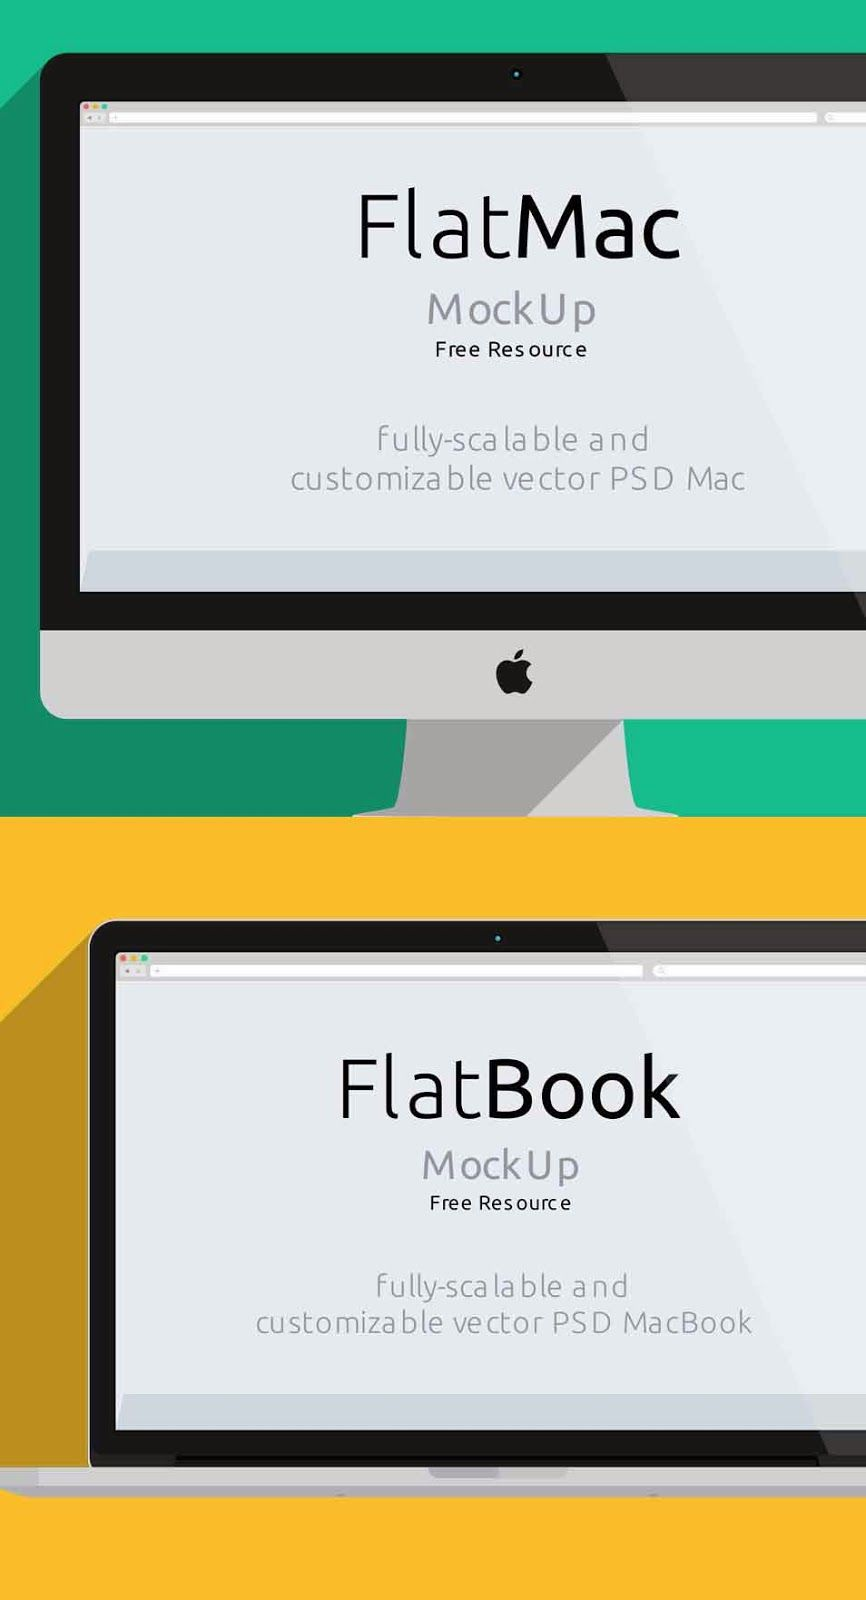 100 Macbook Psd Vector Mockups Free Mockup Templates Web Design Web App Design